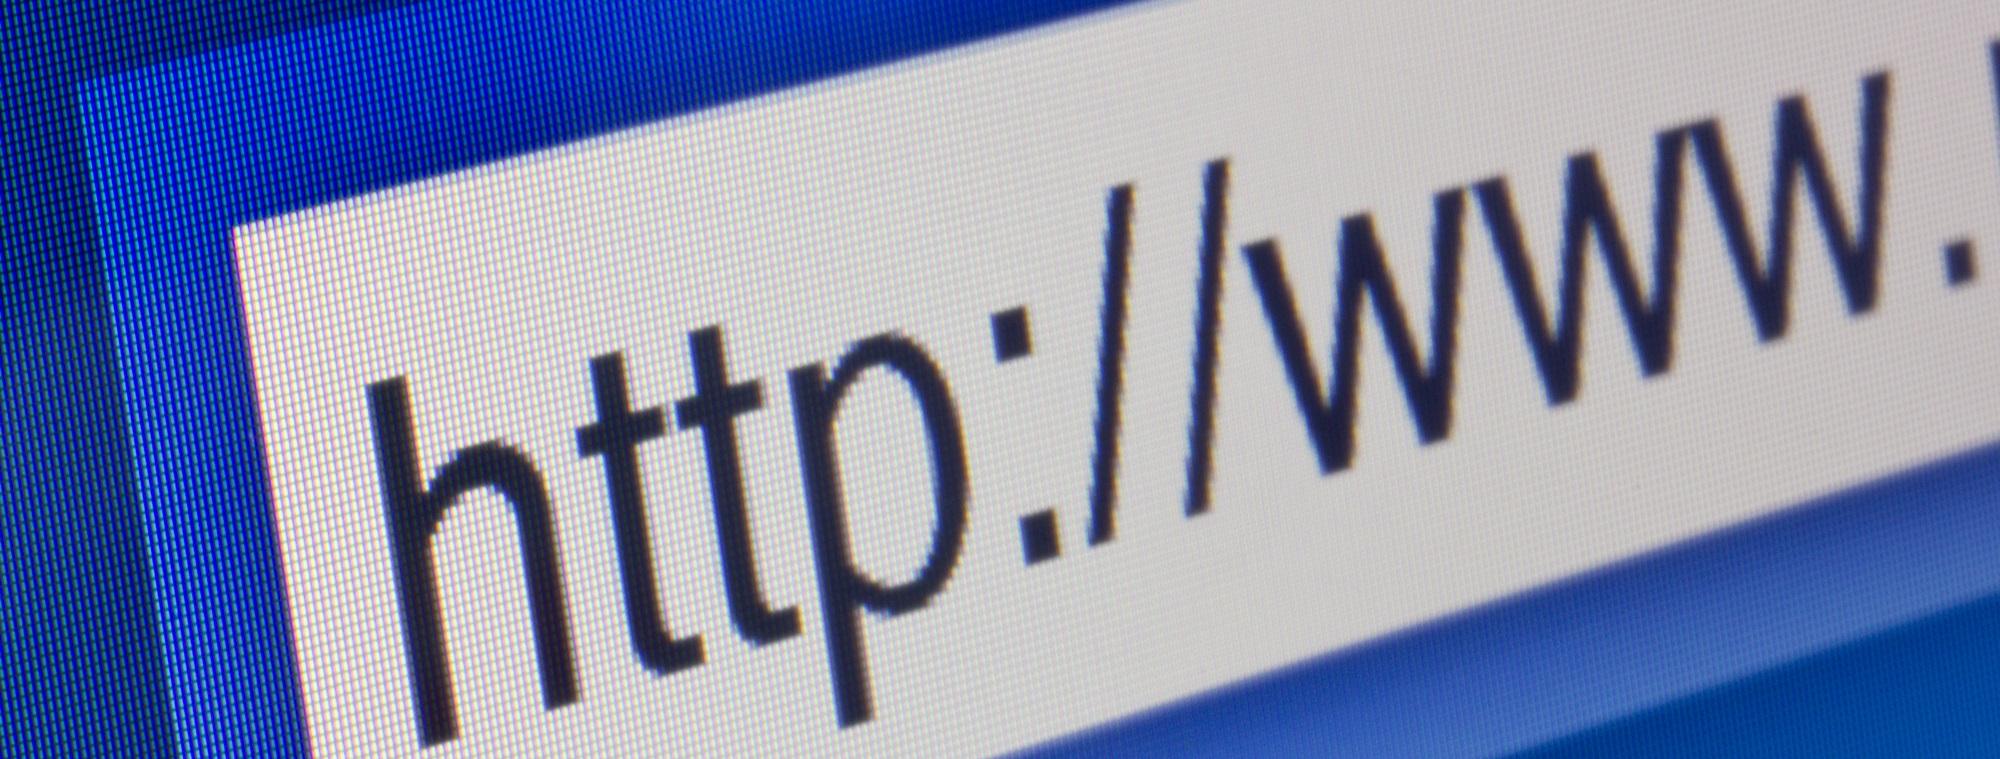 Messaging Service Voxer Introduces Web App